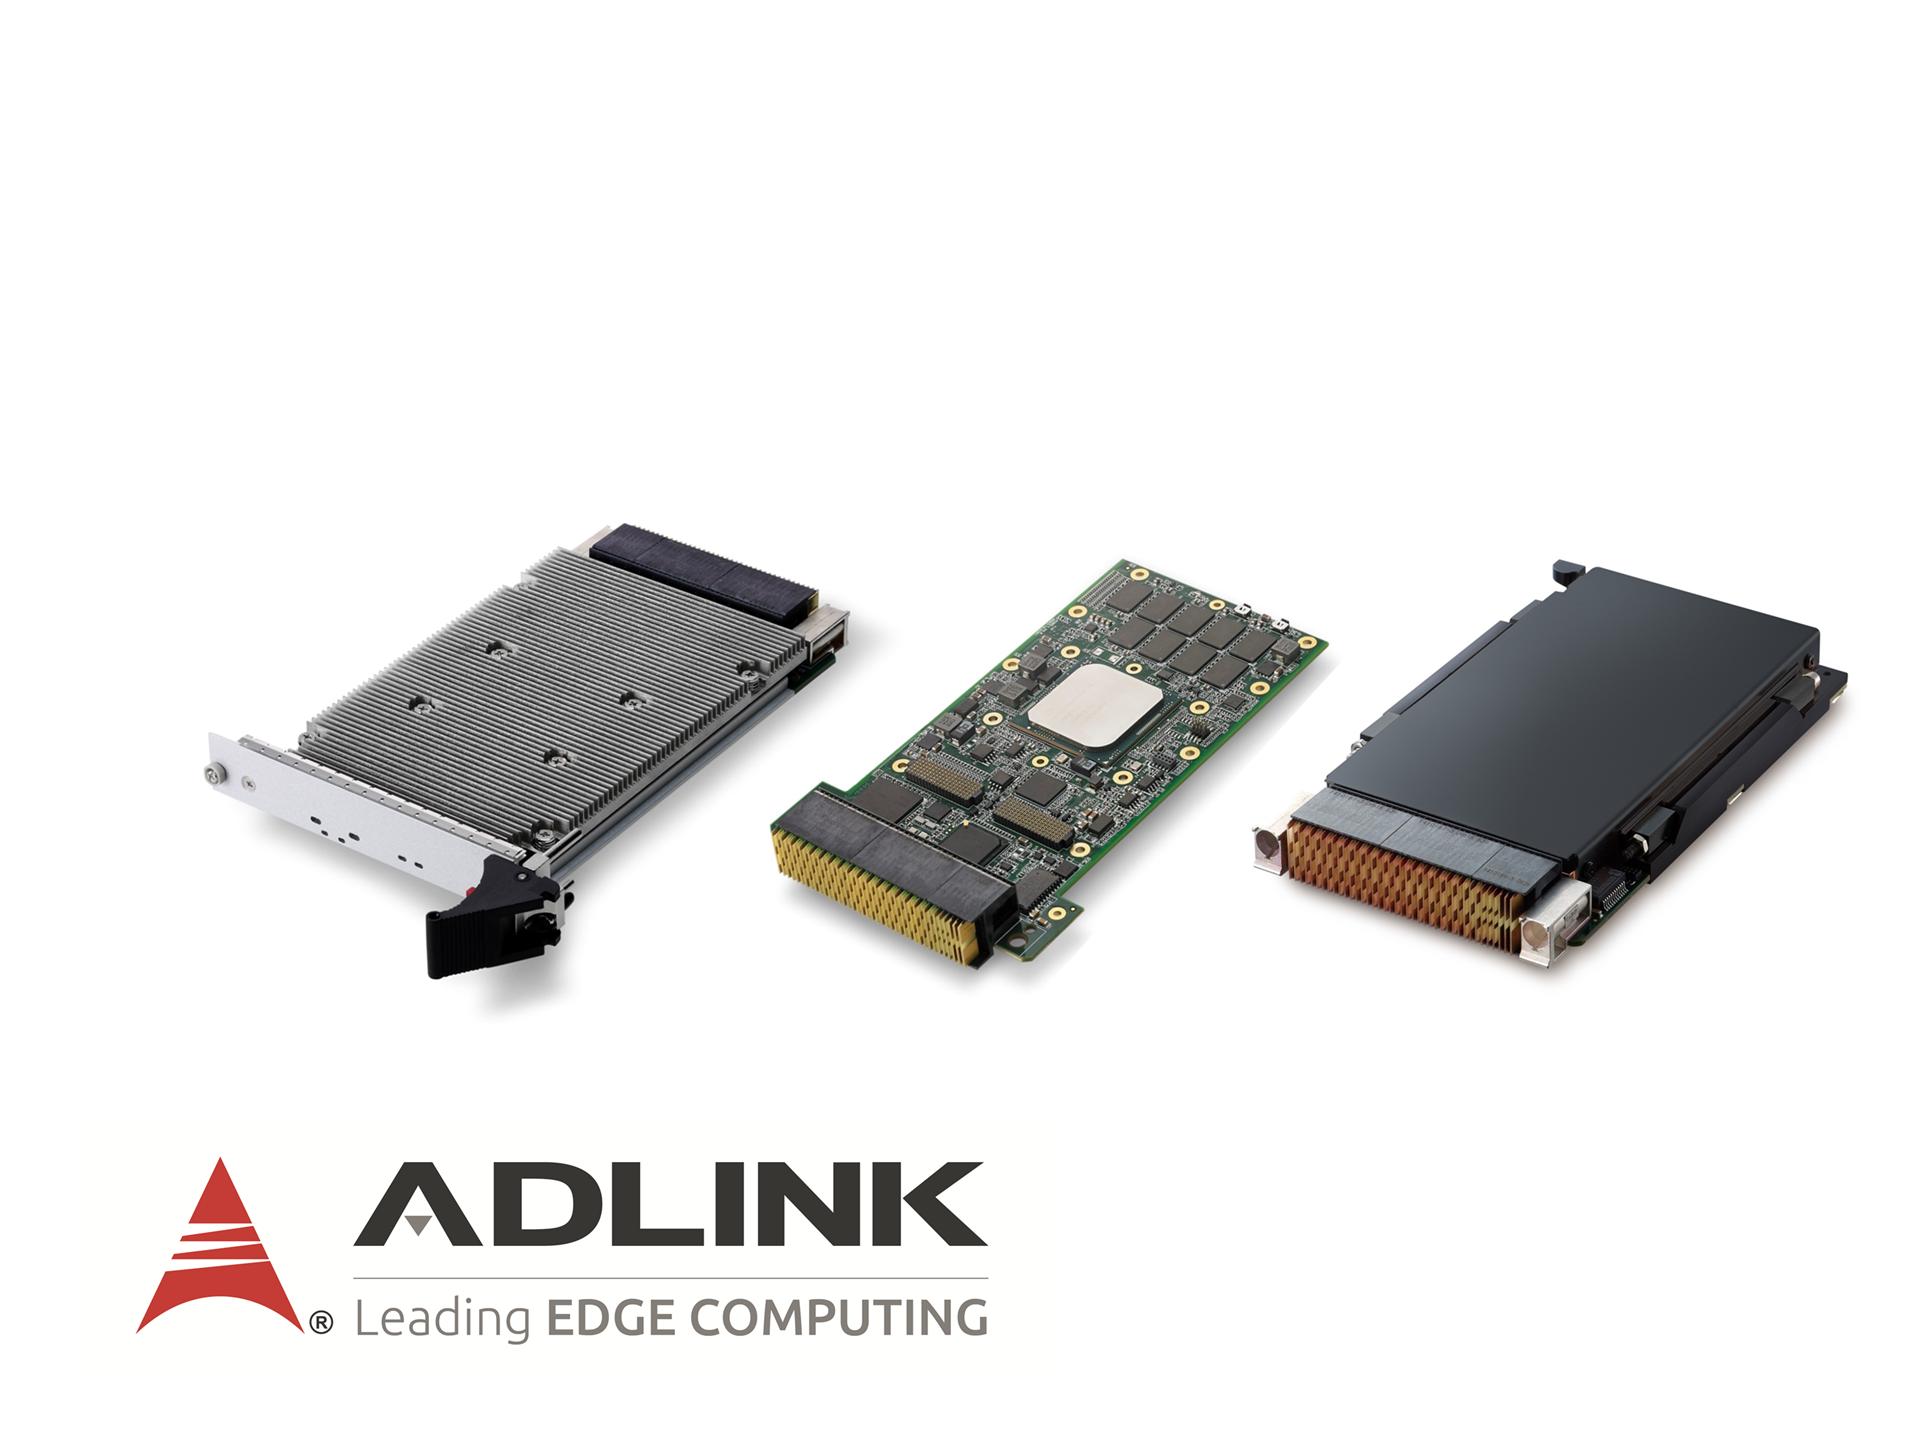 Product News - ADLINK Technology